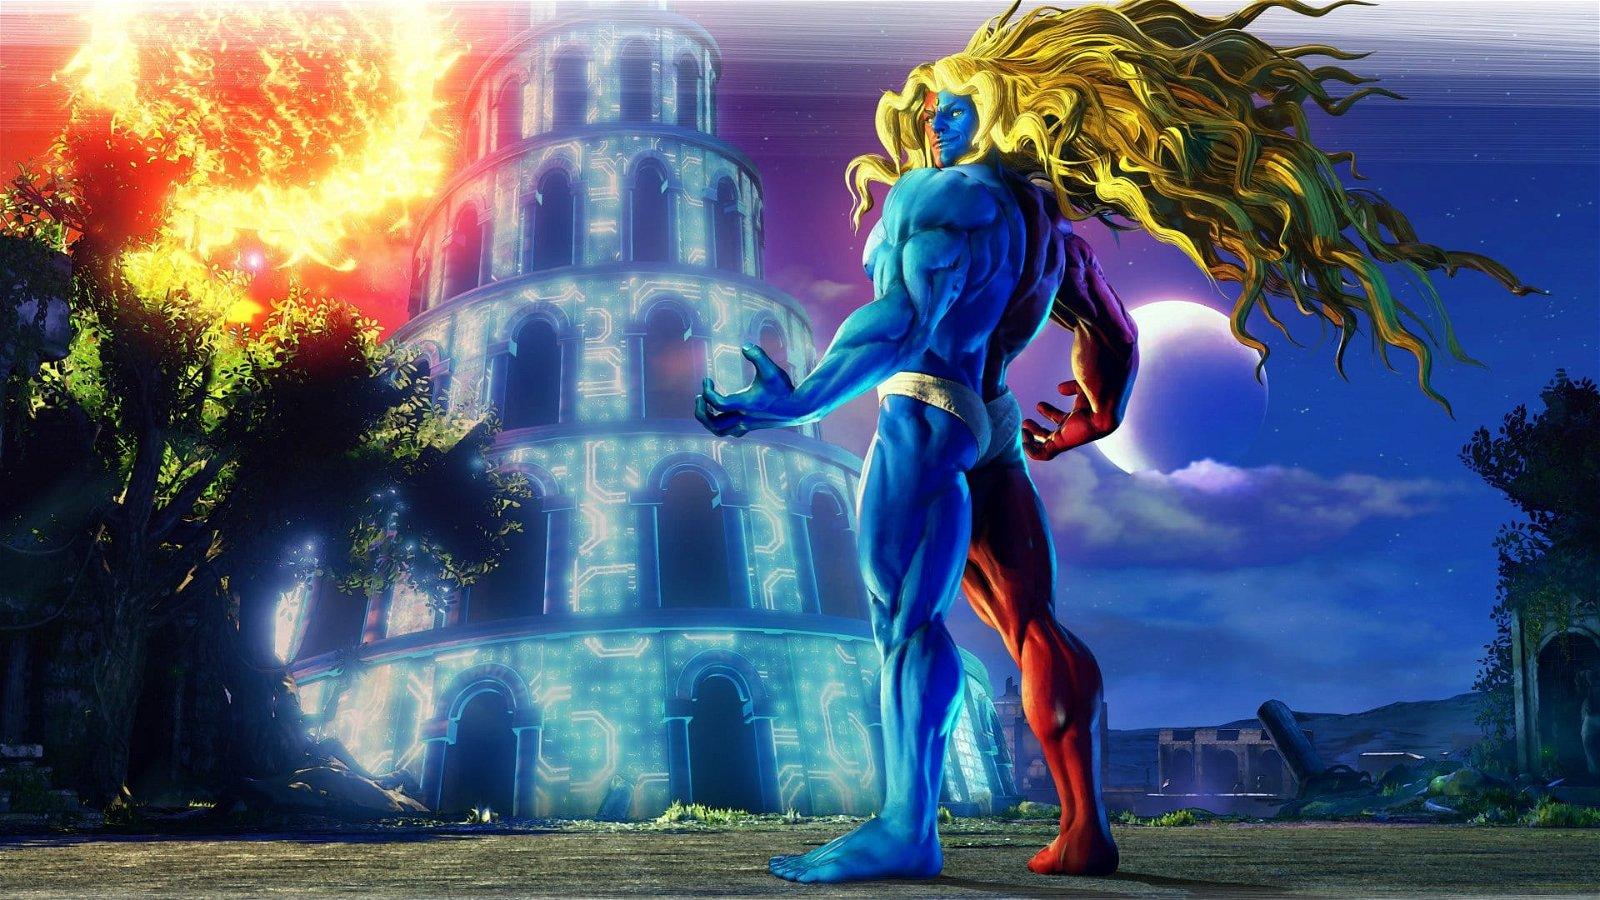 Capcom Announces Street Fighter V: Champion Edition, Coming February 1